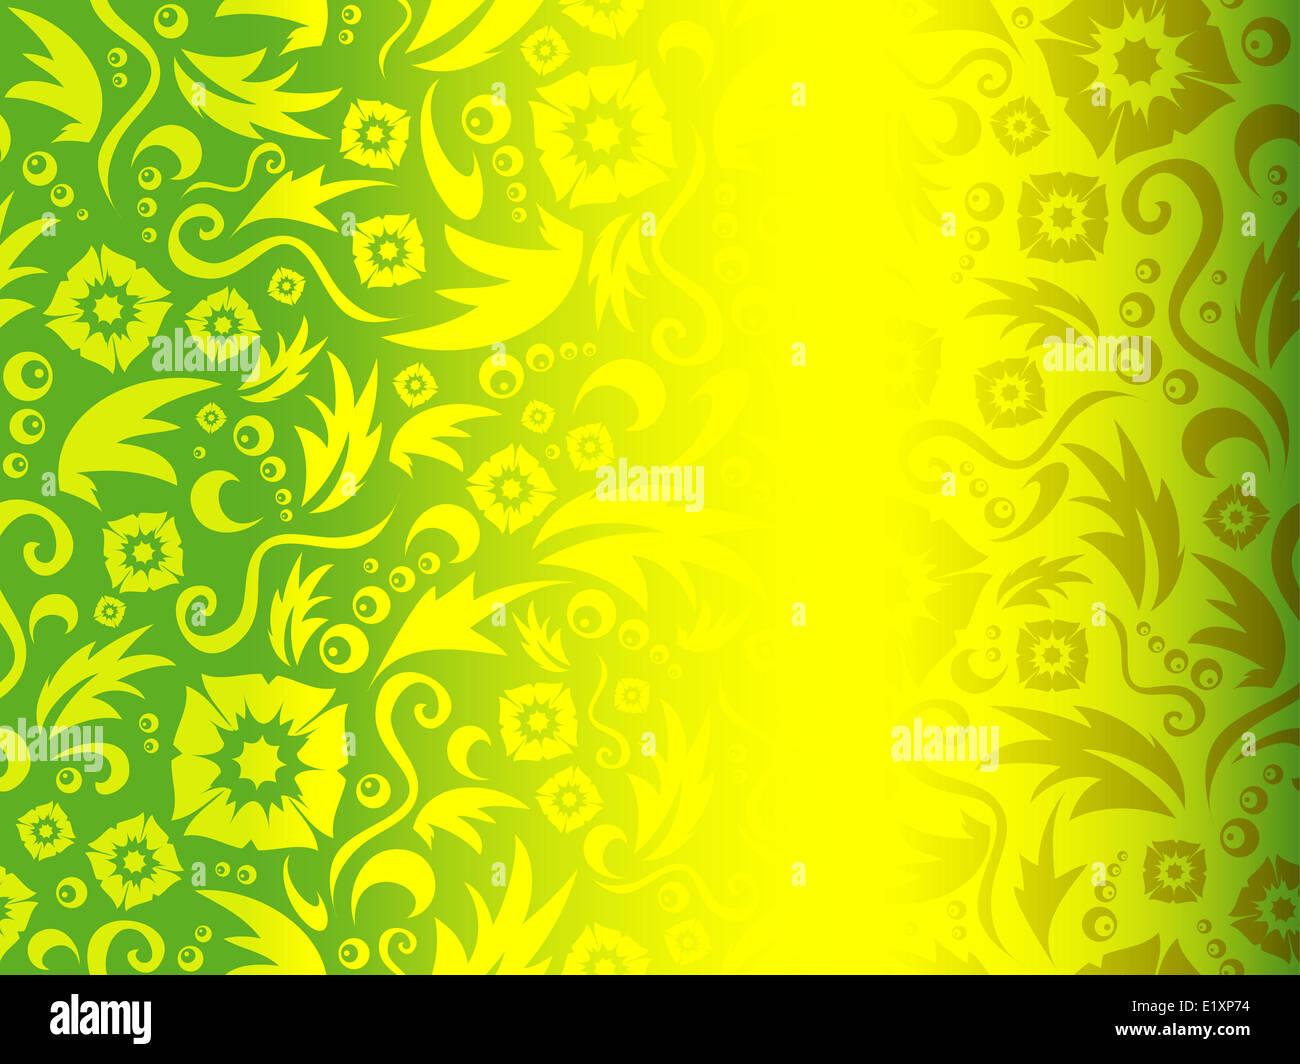 Flower pattern - Stock Image